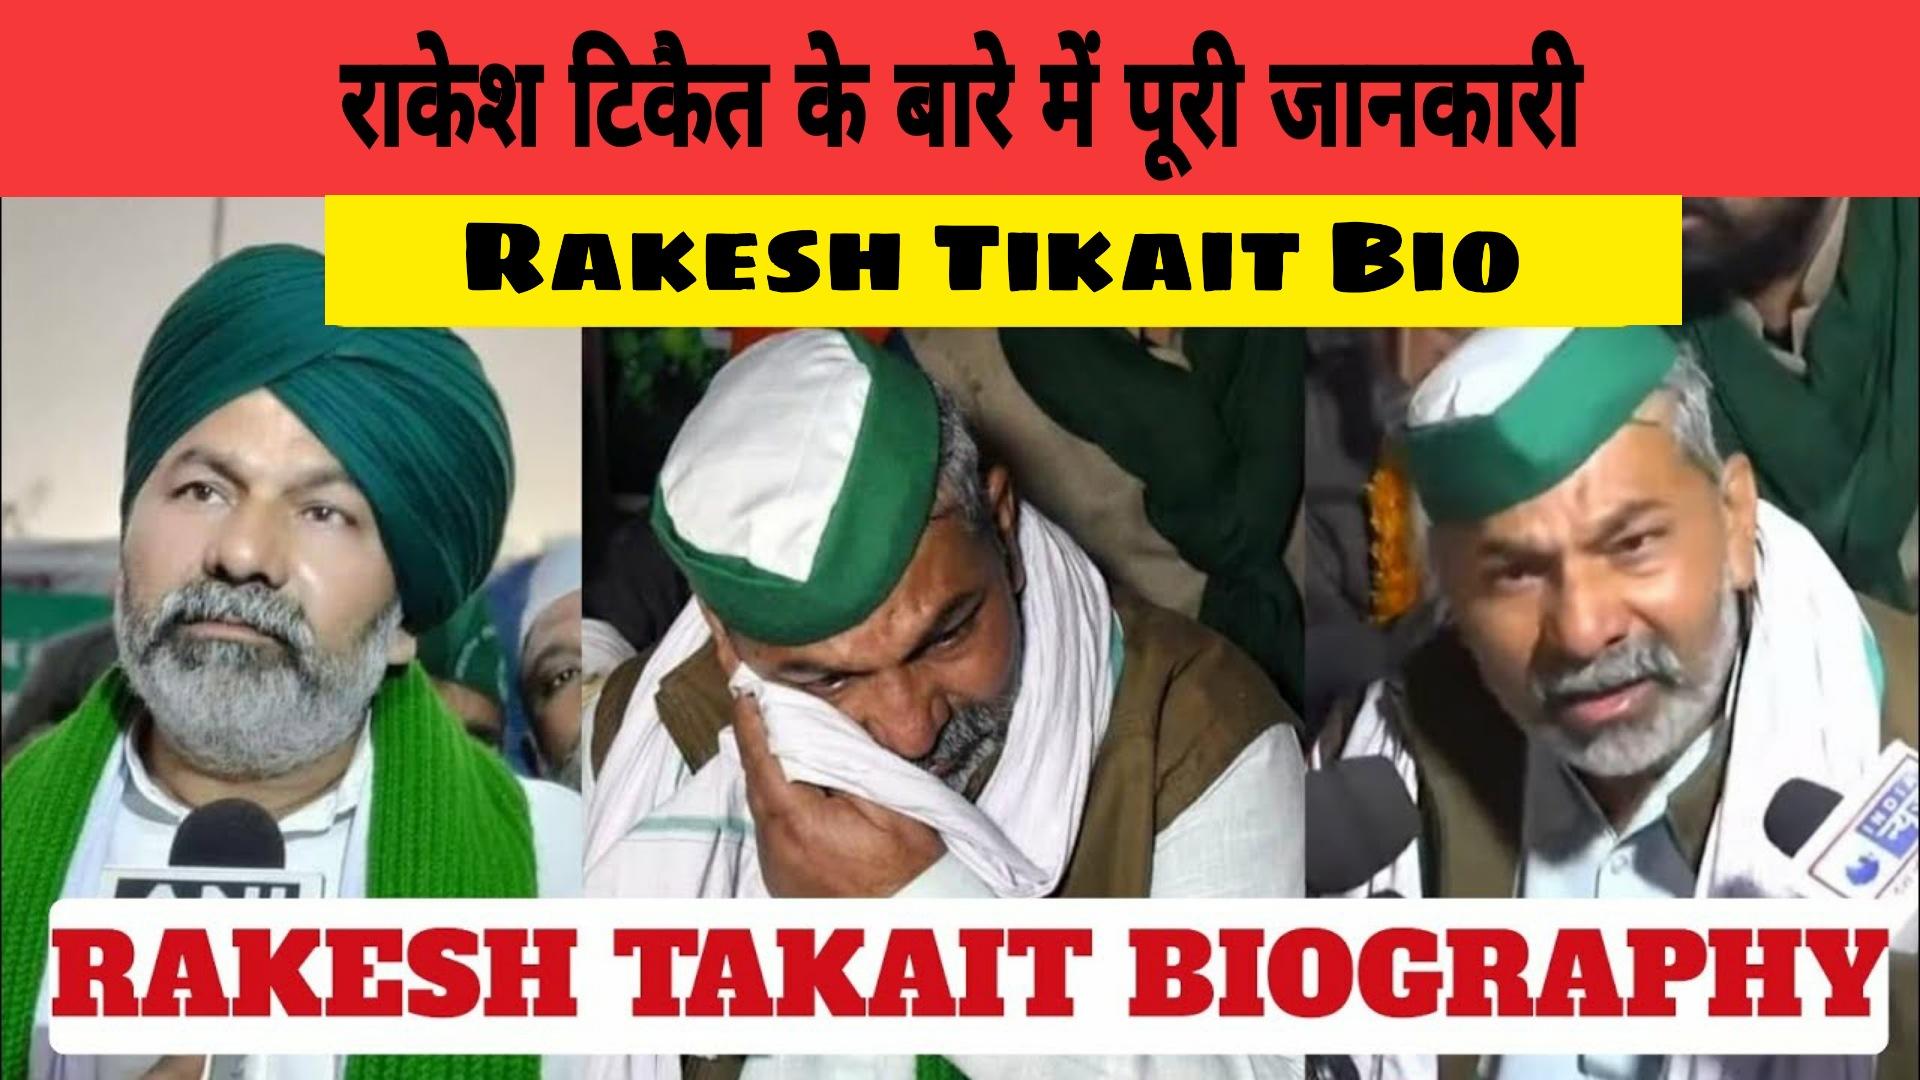 Rakesh Tikait Biography in Hindi